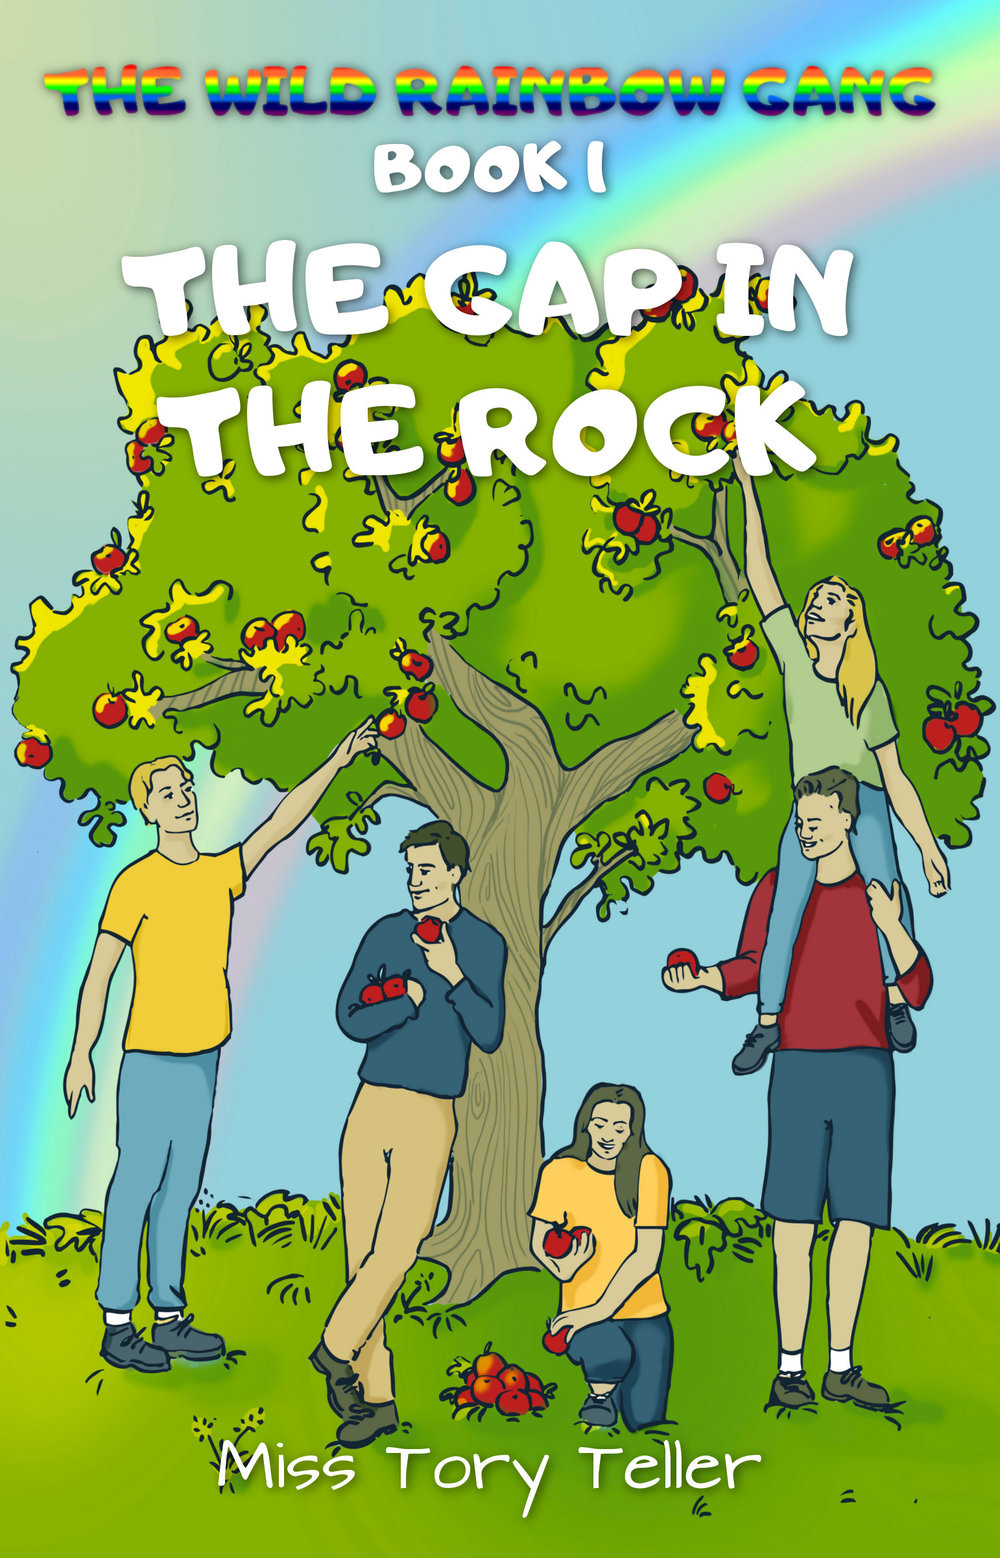 Rainbow Gang Book 1 ebook cover (1).jpg